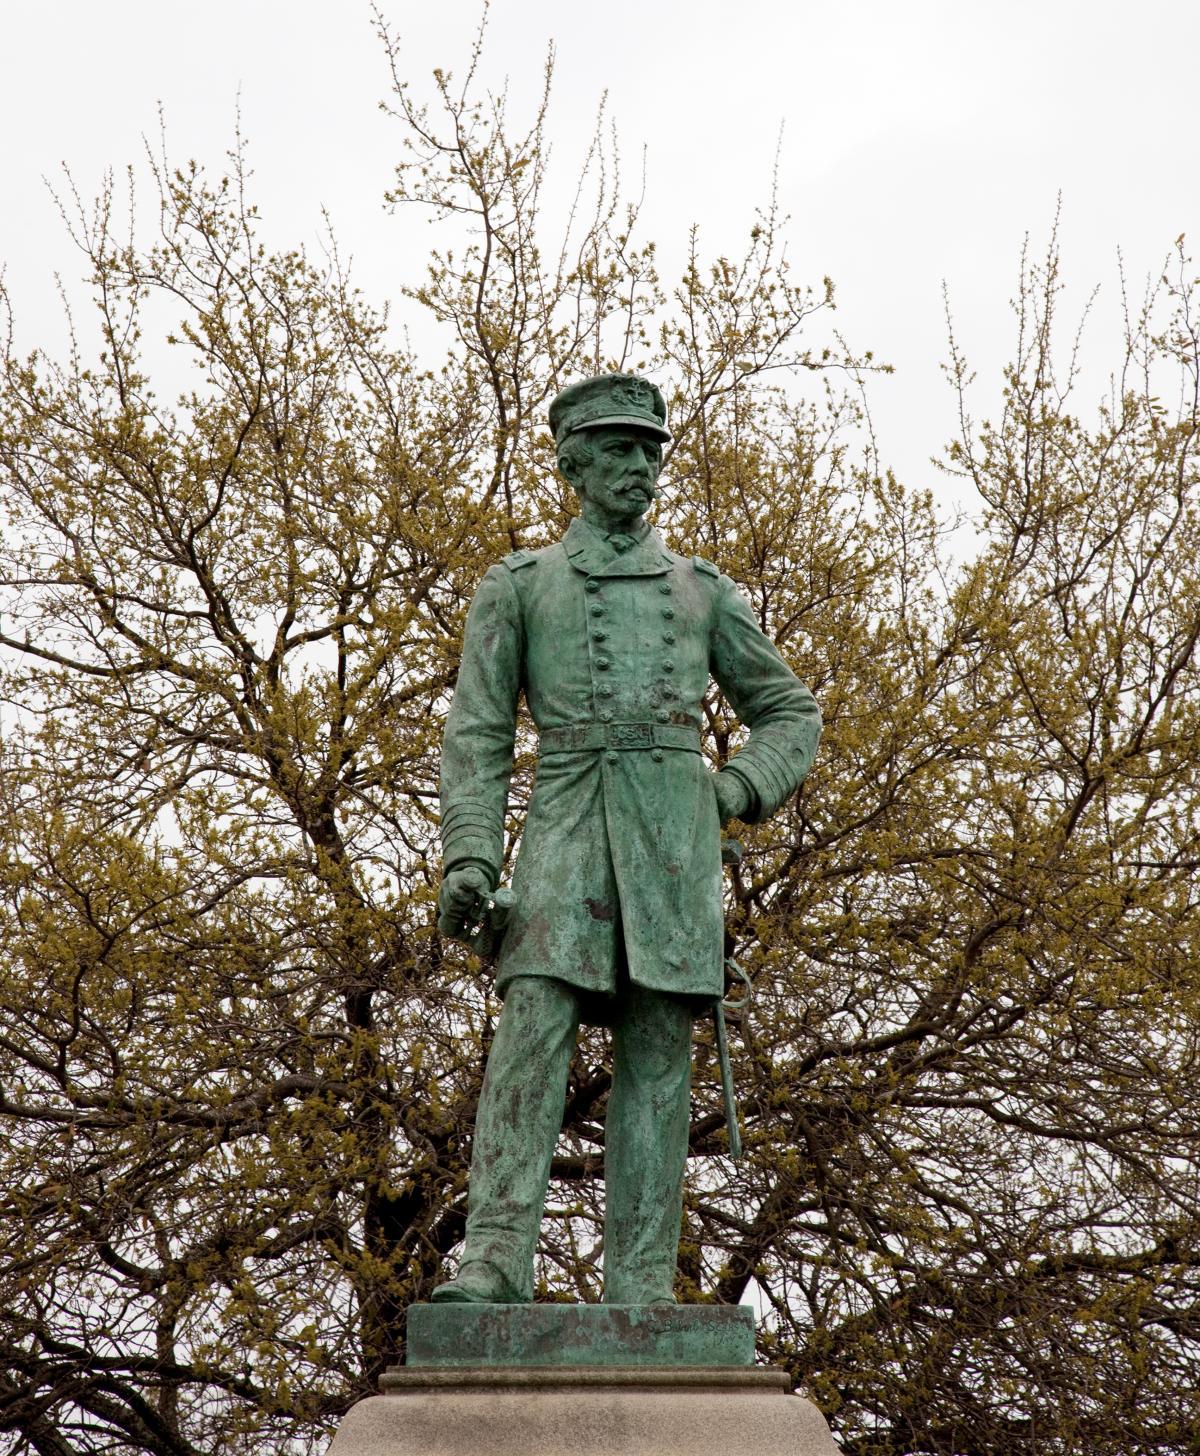 Statue of Rear Adm. Raphael Semmes, Mobile, Ala., in 2010.